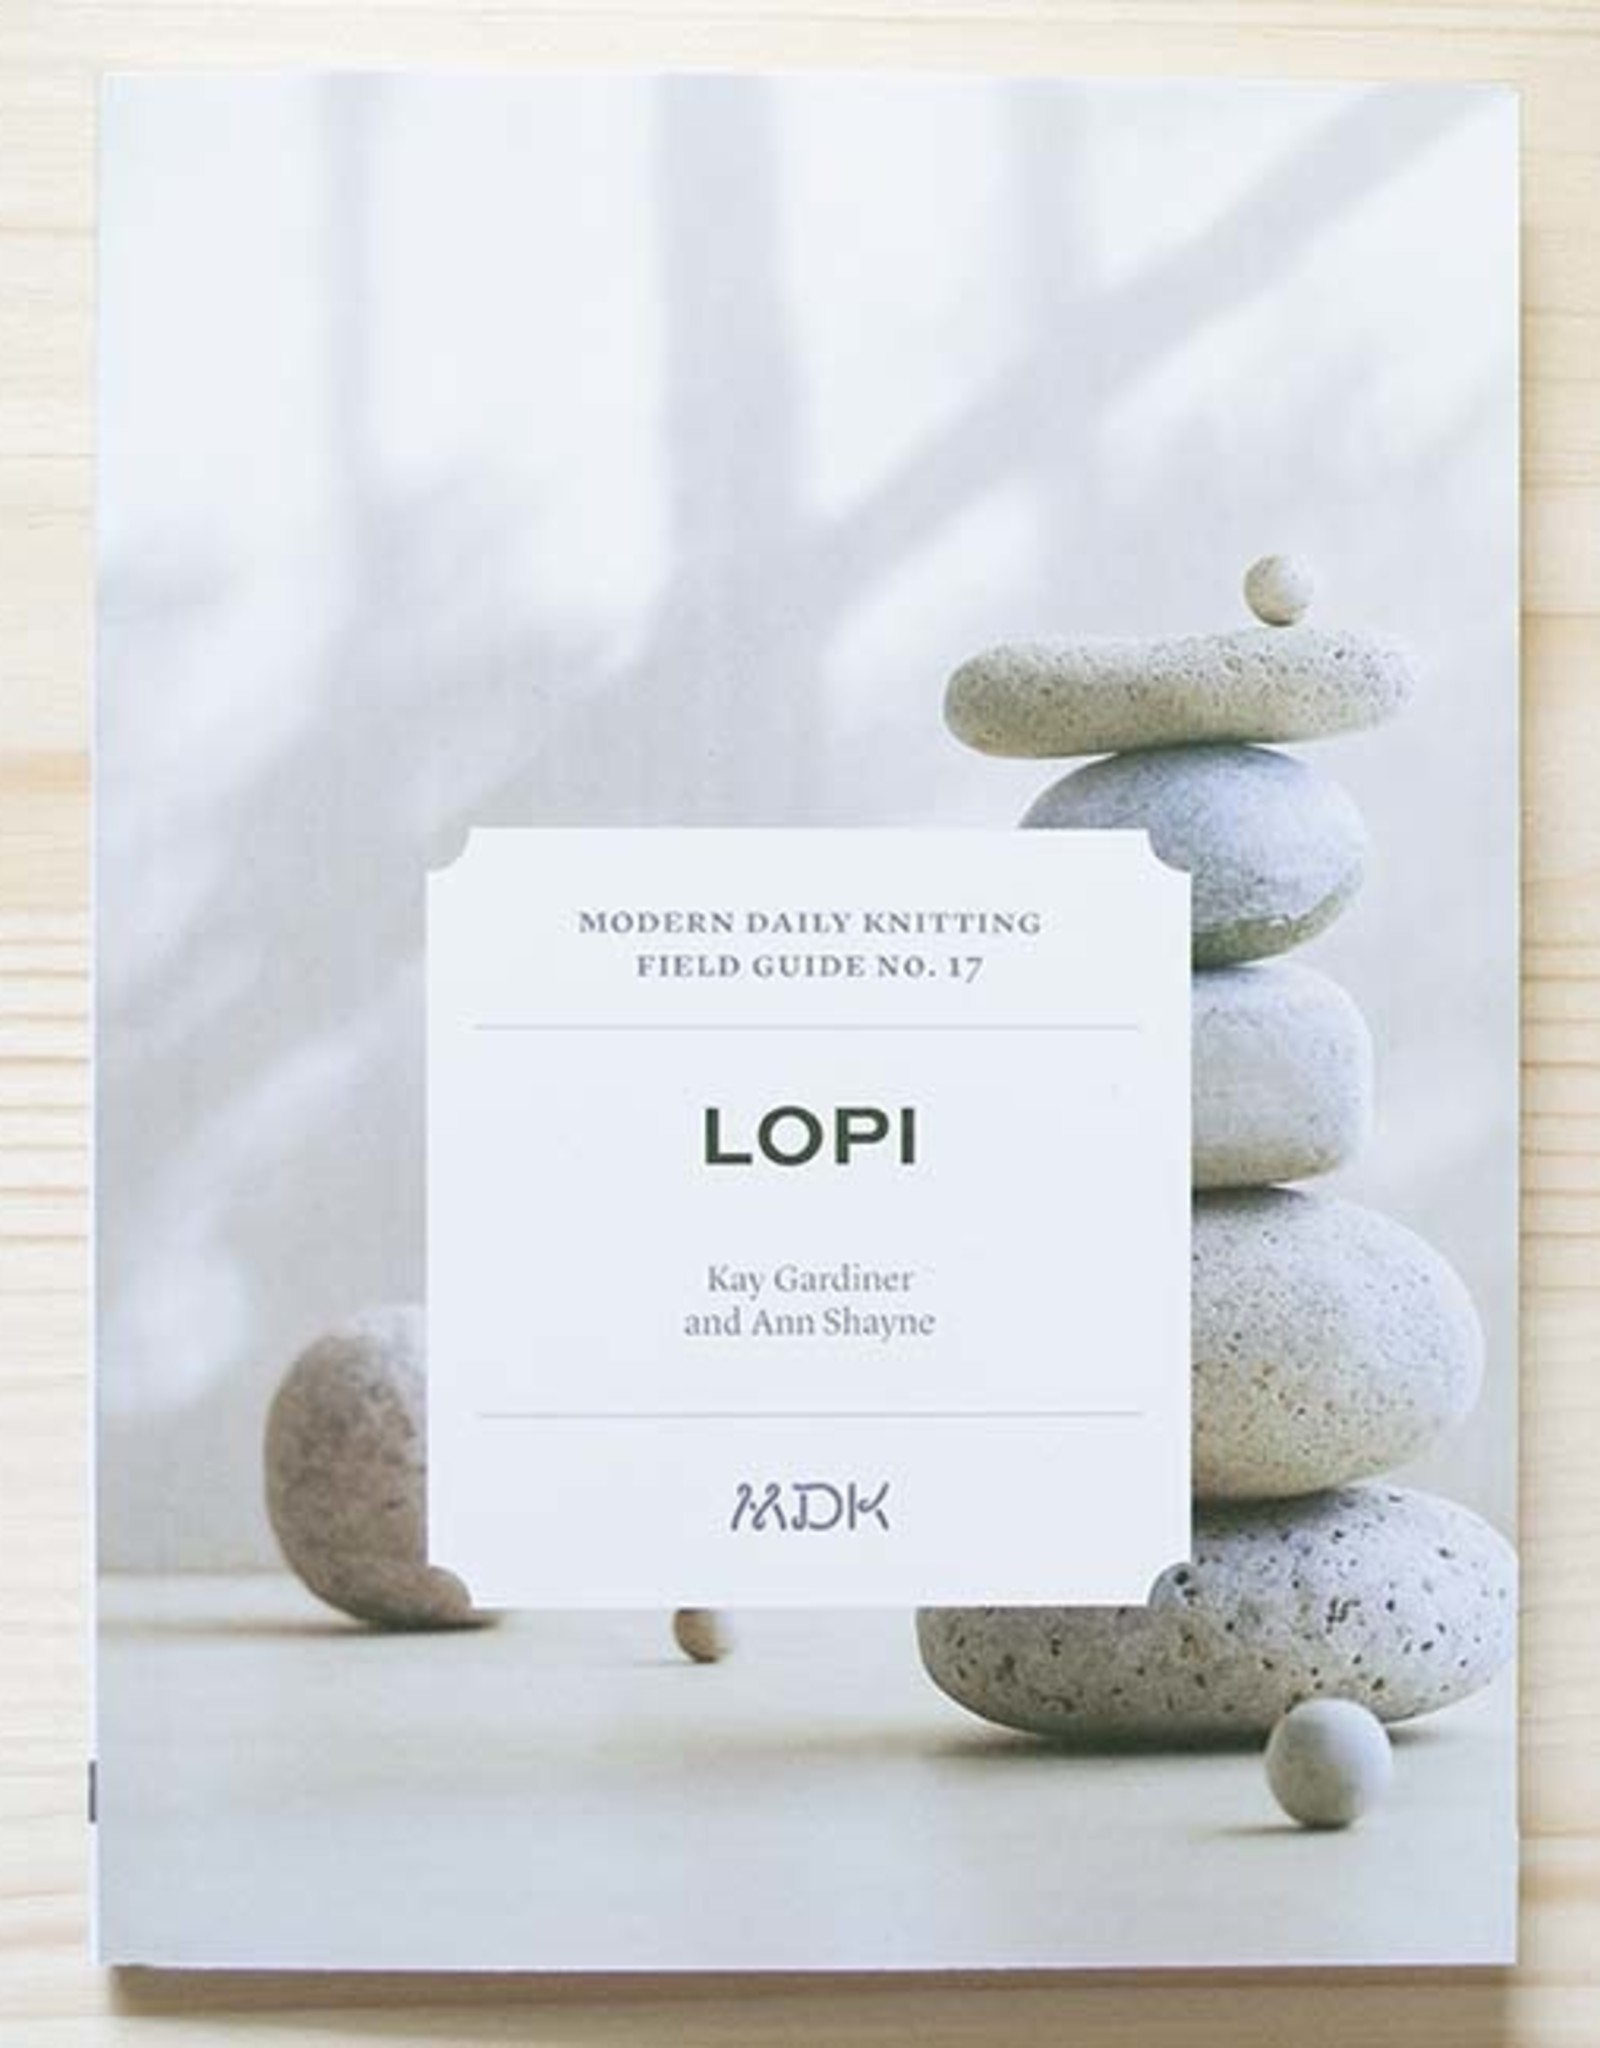 Modern Daily Knitting Modern Daily Field Guide No. 17: Lopi